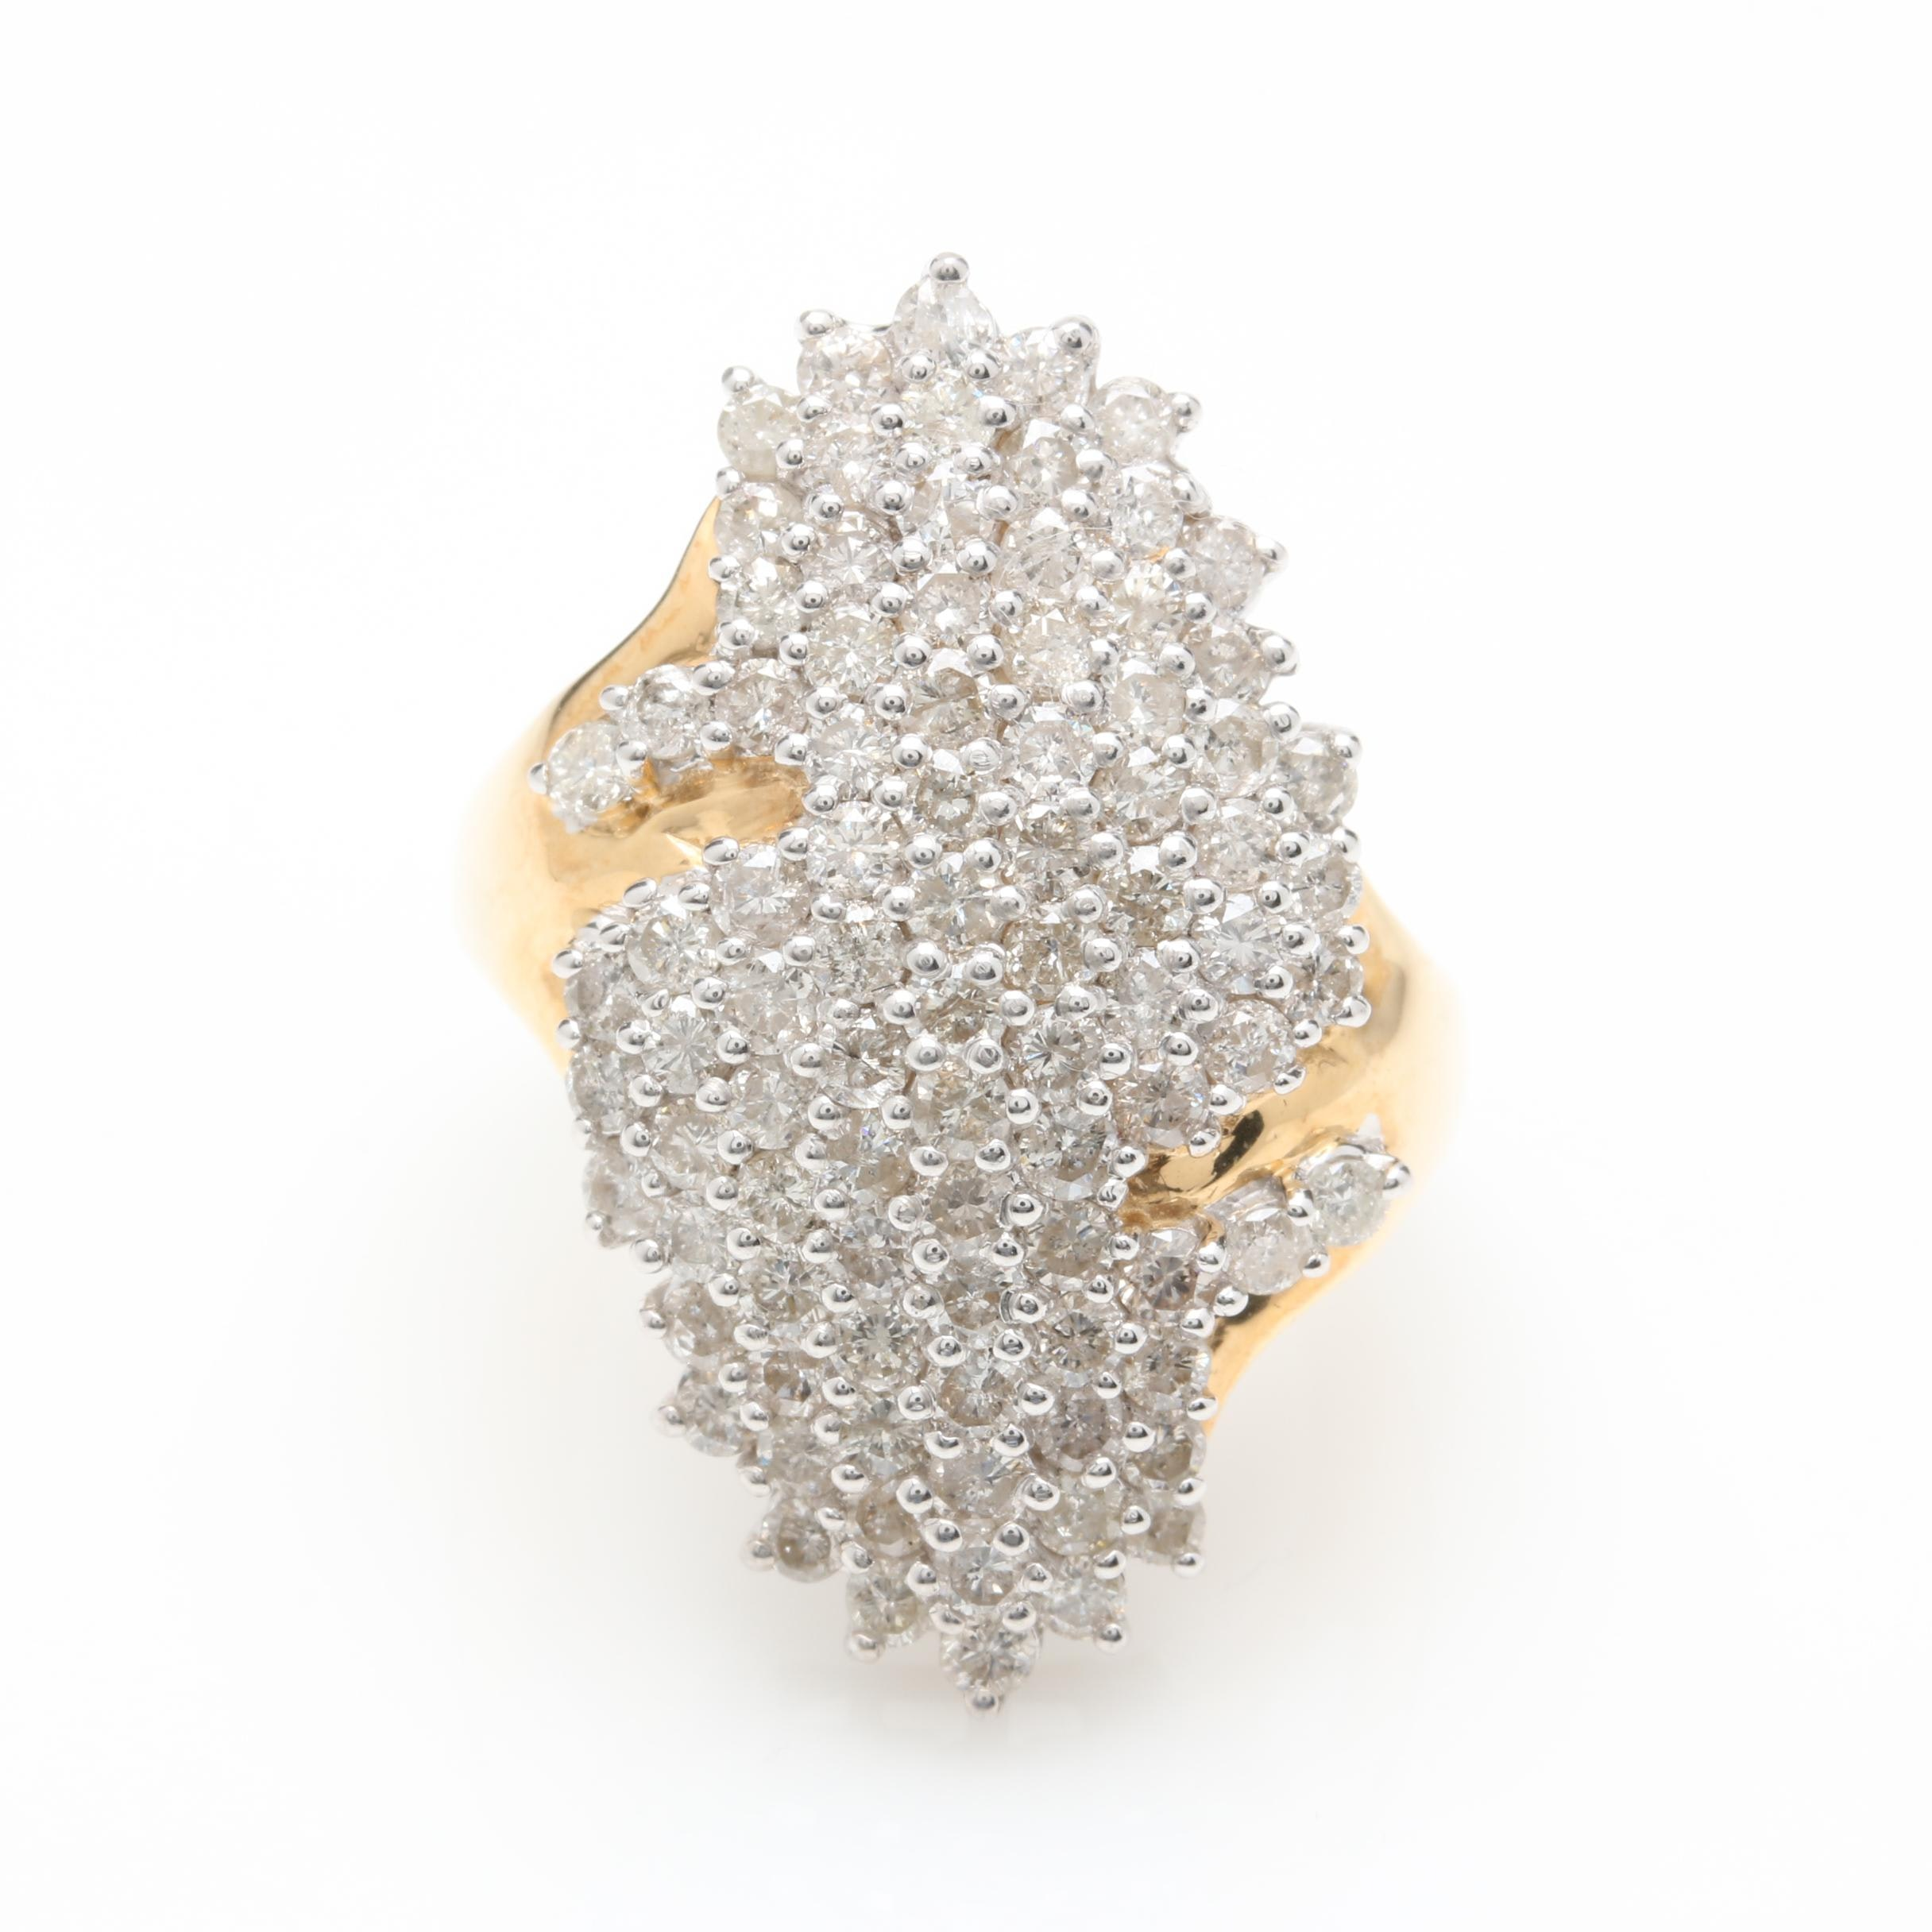 14K Yellow Gold 2.67 CTW Diamond Ring